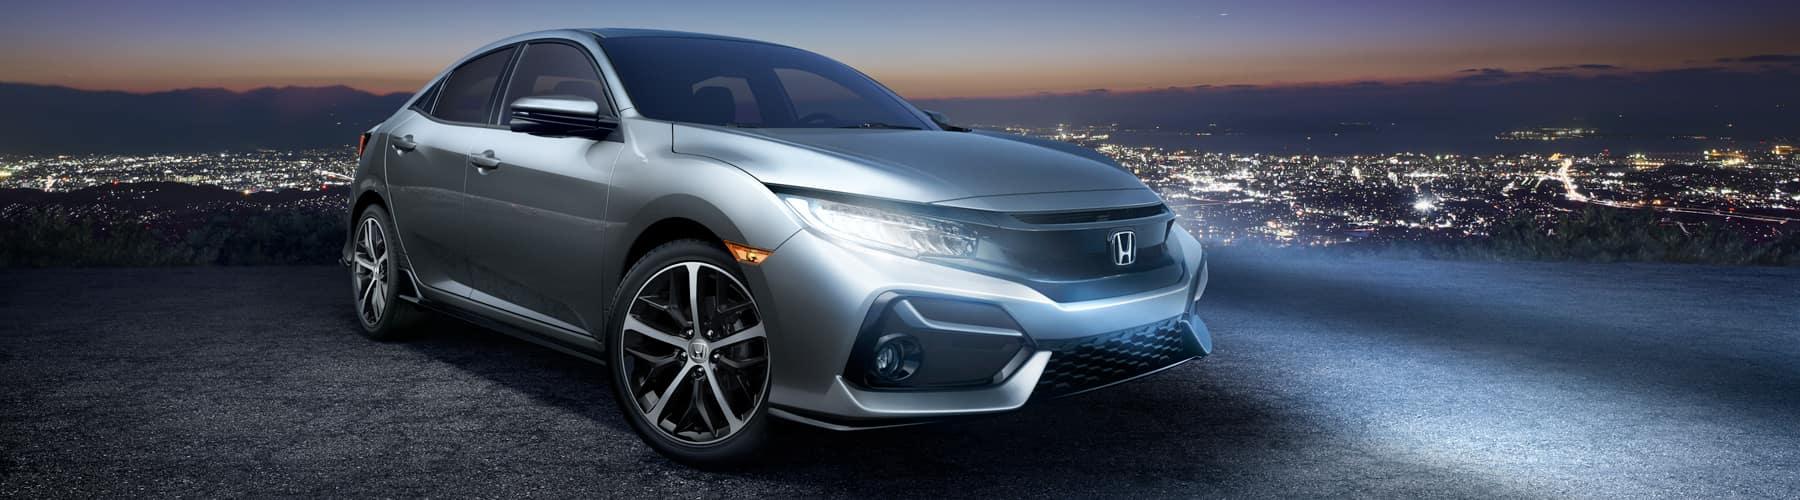 2020 Honda Civic Hatchback Slider